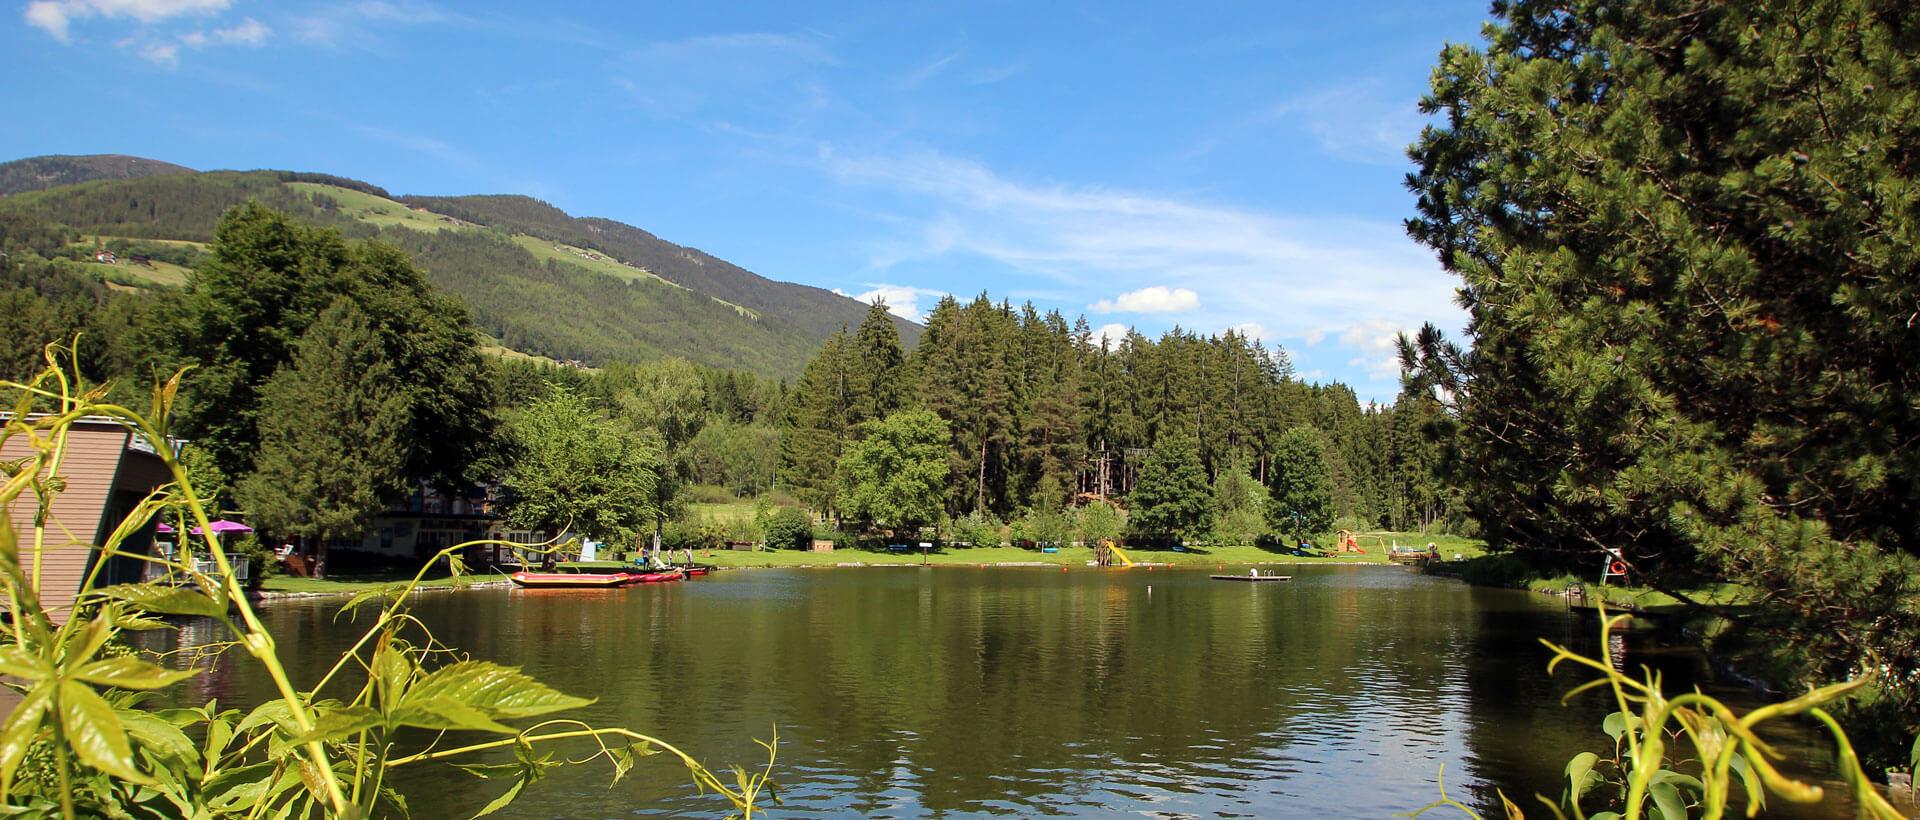 Urlaub im Pustertal - Kronplatz / Südtirol